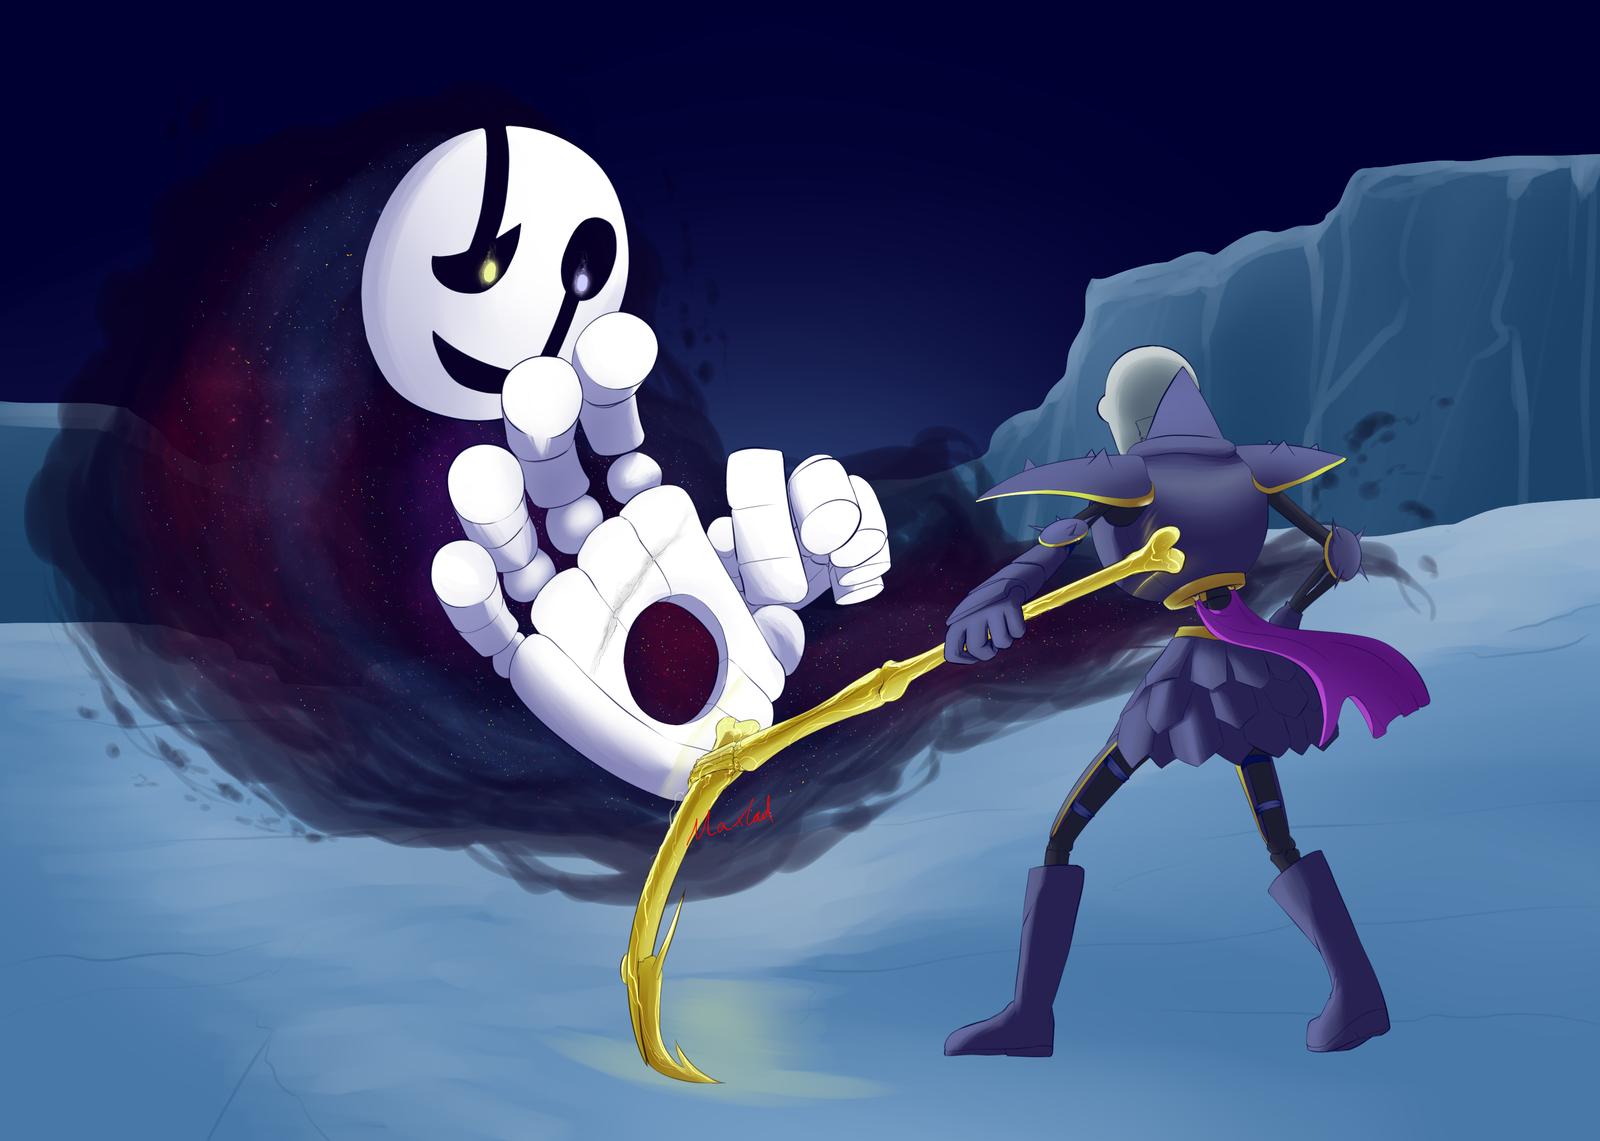 [Rivertale] Fight by Maxlad